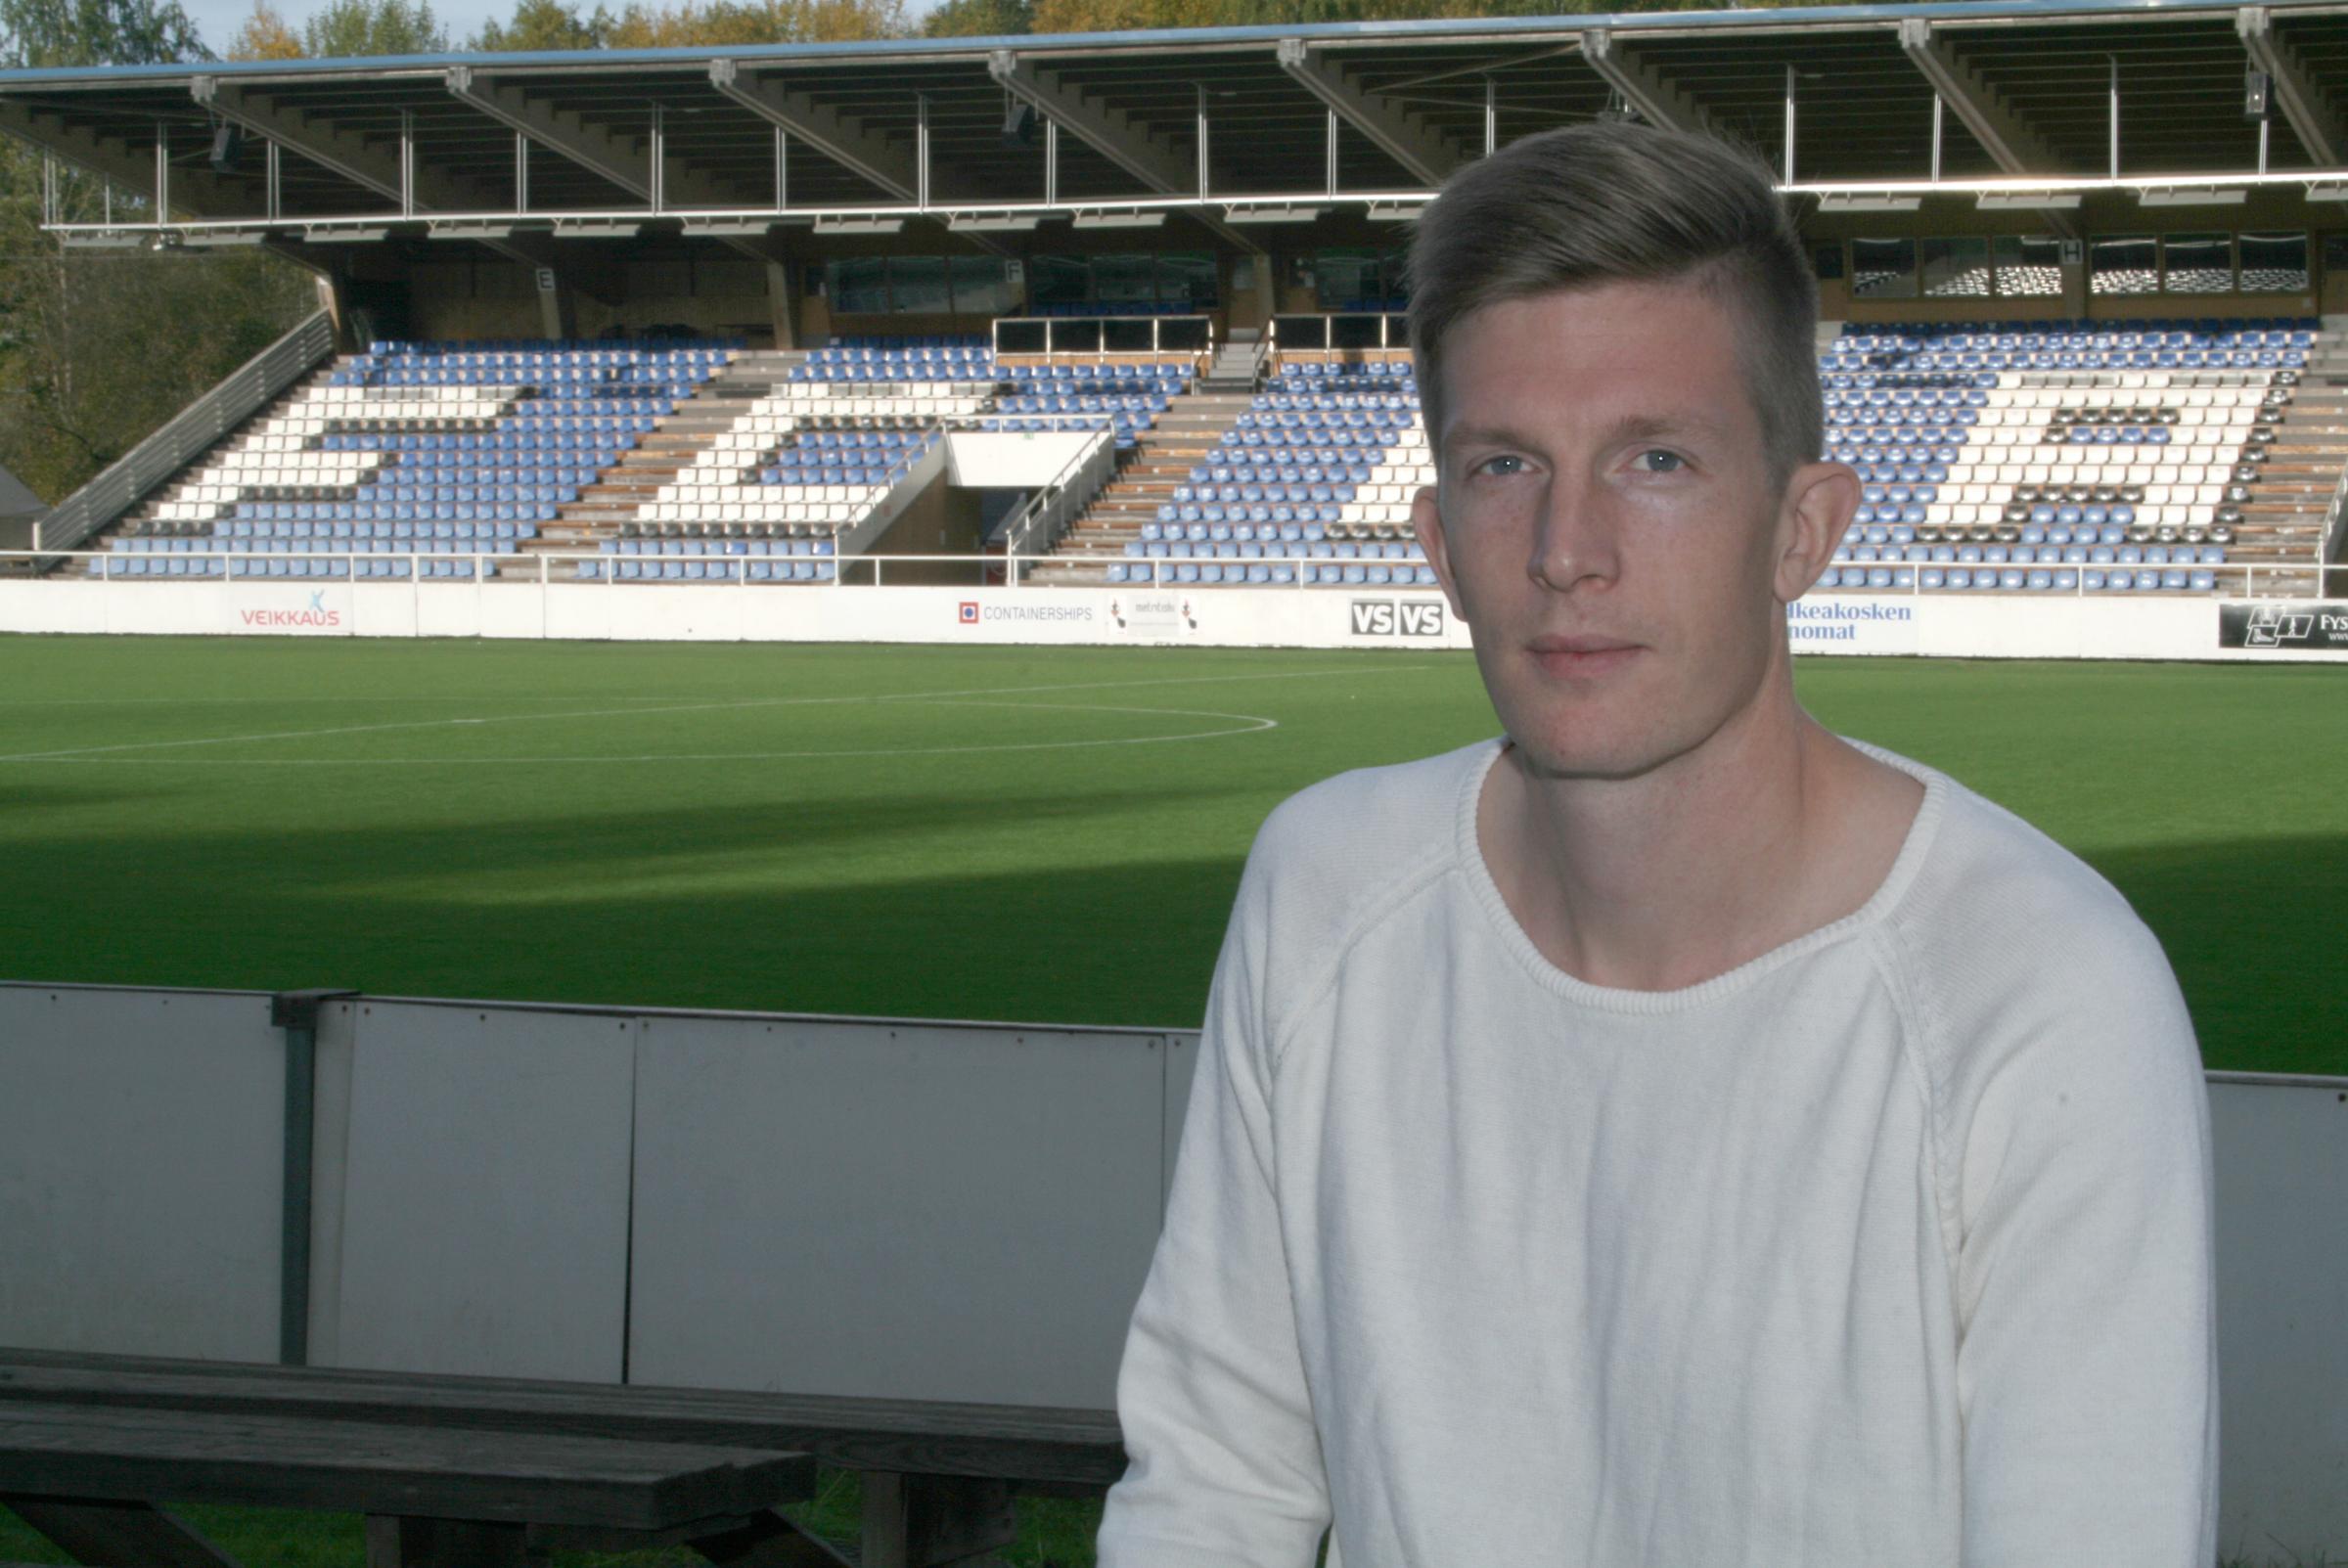 Kalle Multanen